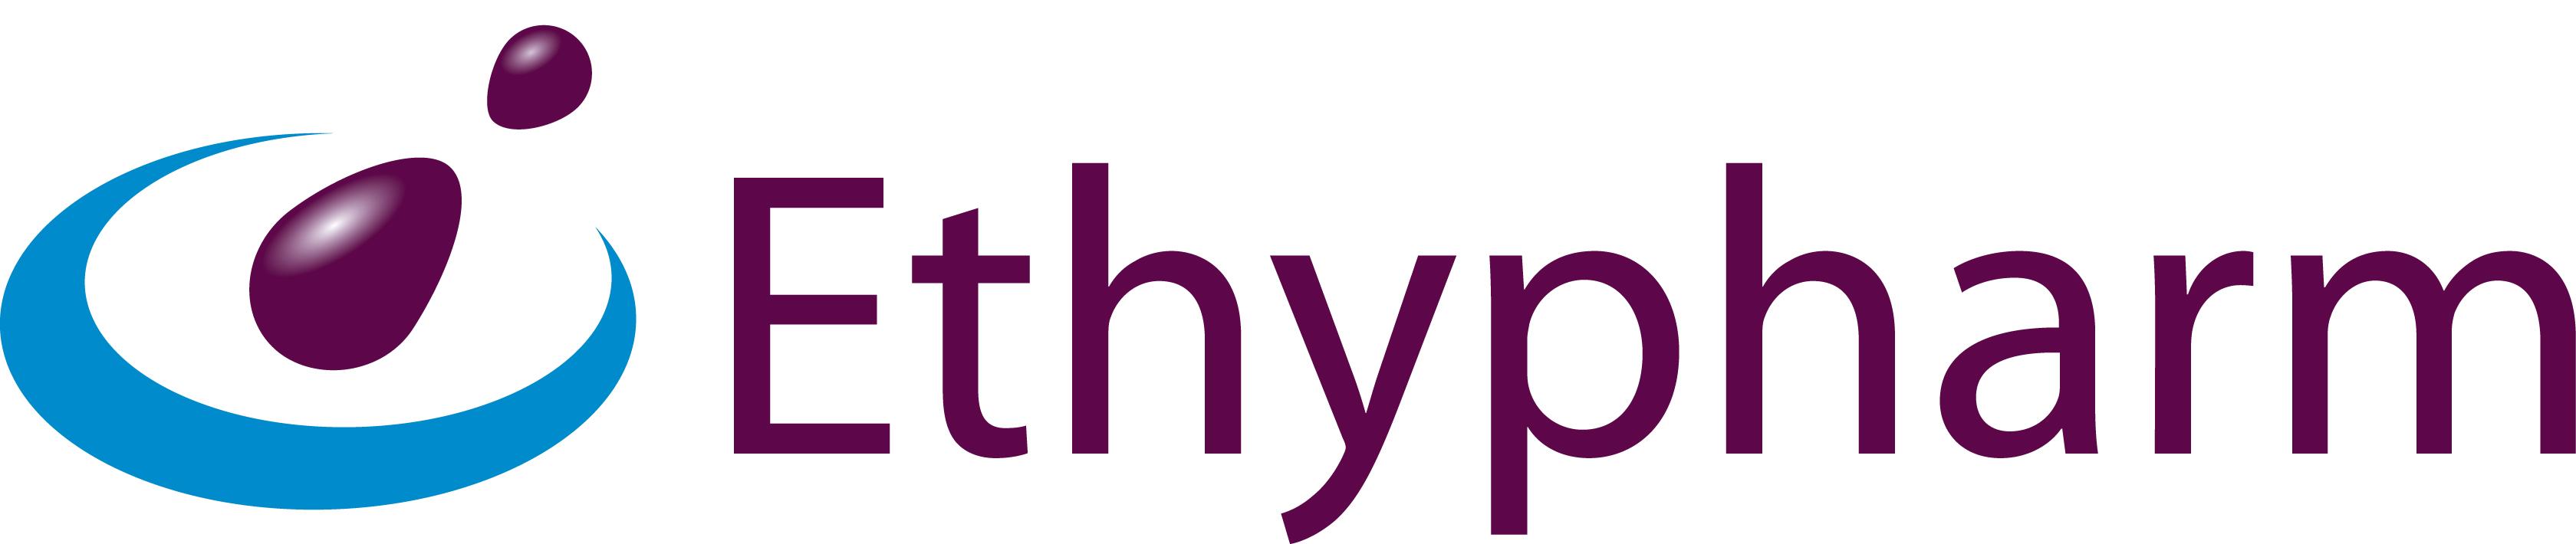 Laboratoires_Ethypharm_logo_rvb(3)